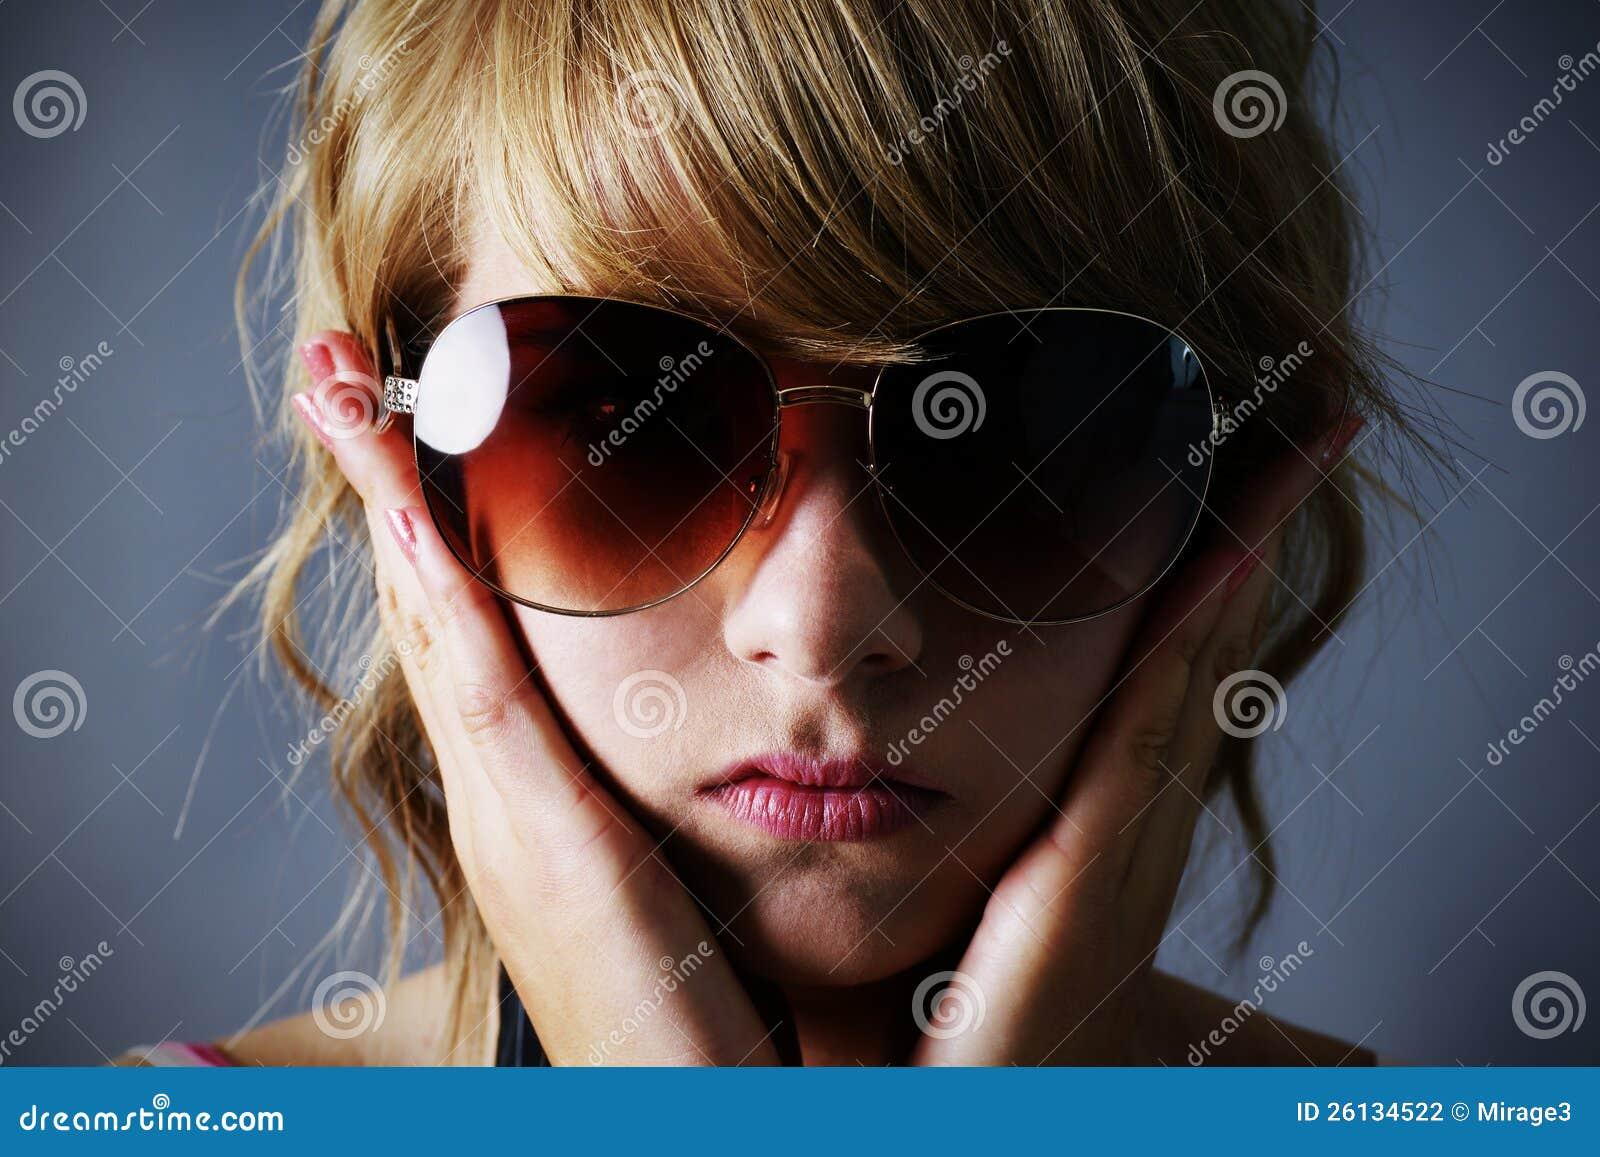 Tempting follow of blond teen holding sunglasses GIRL